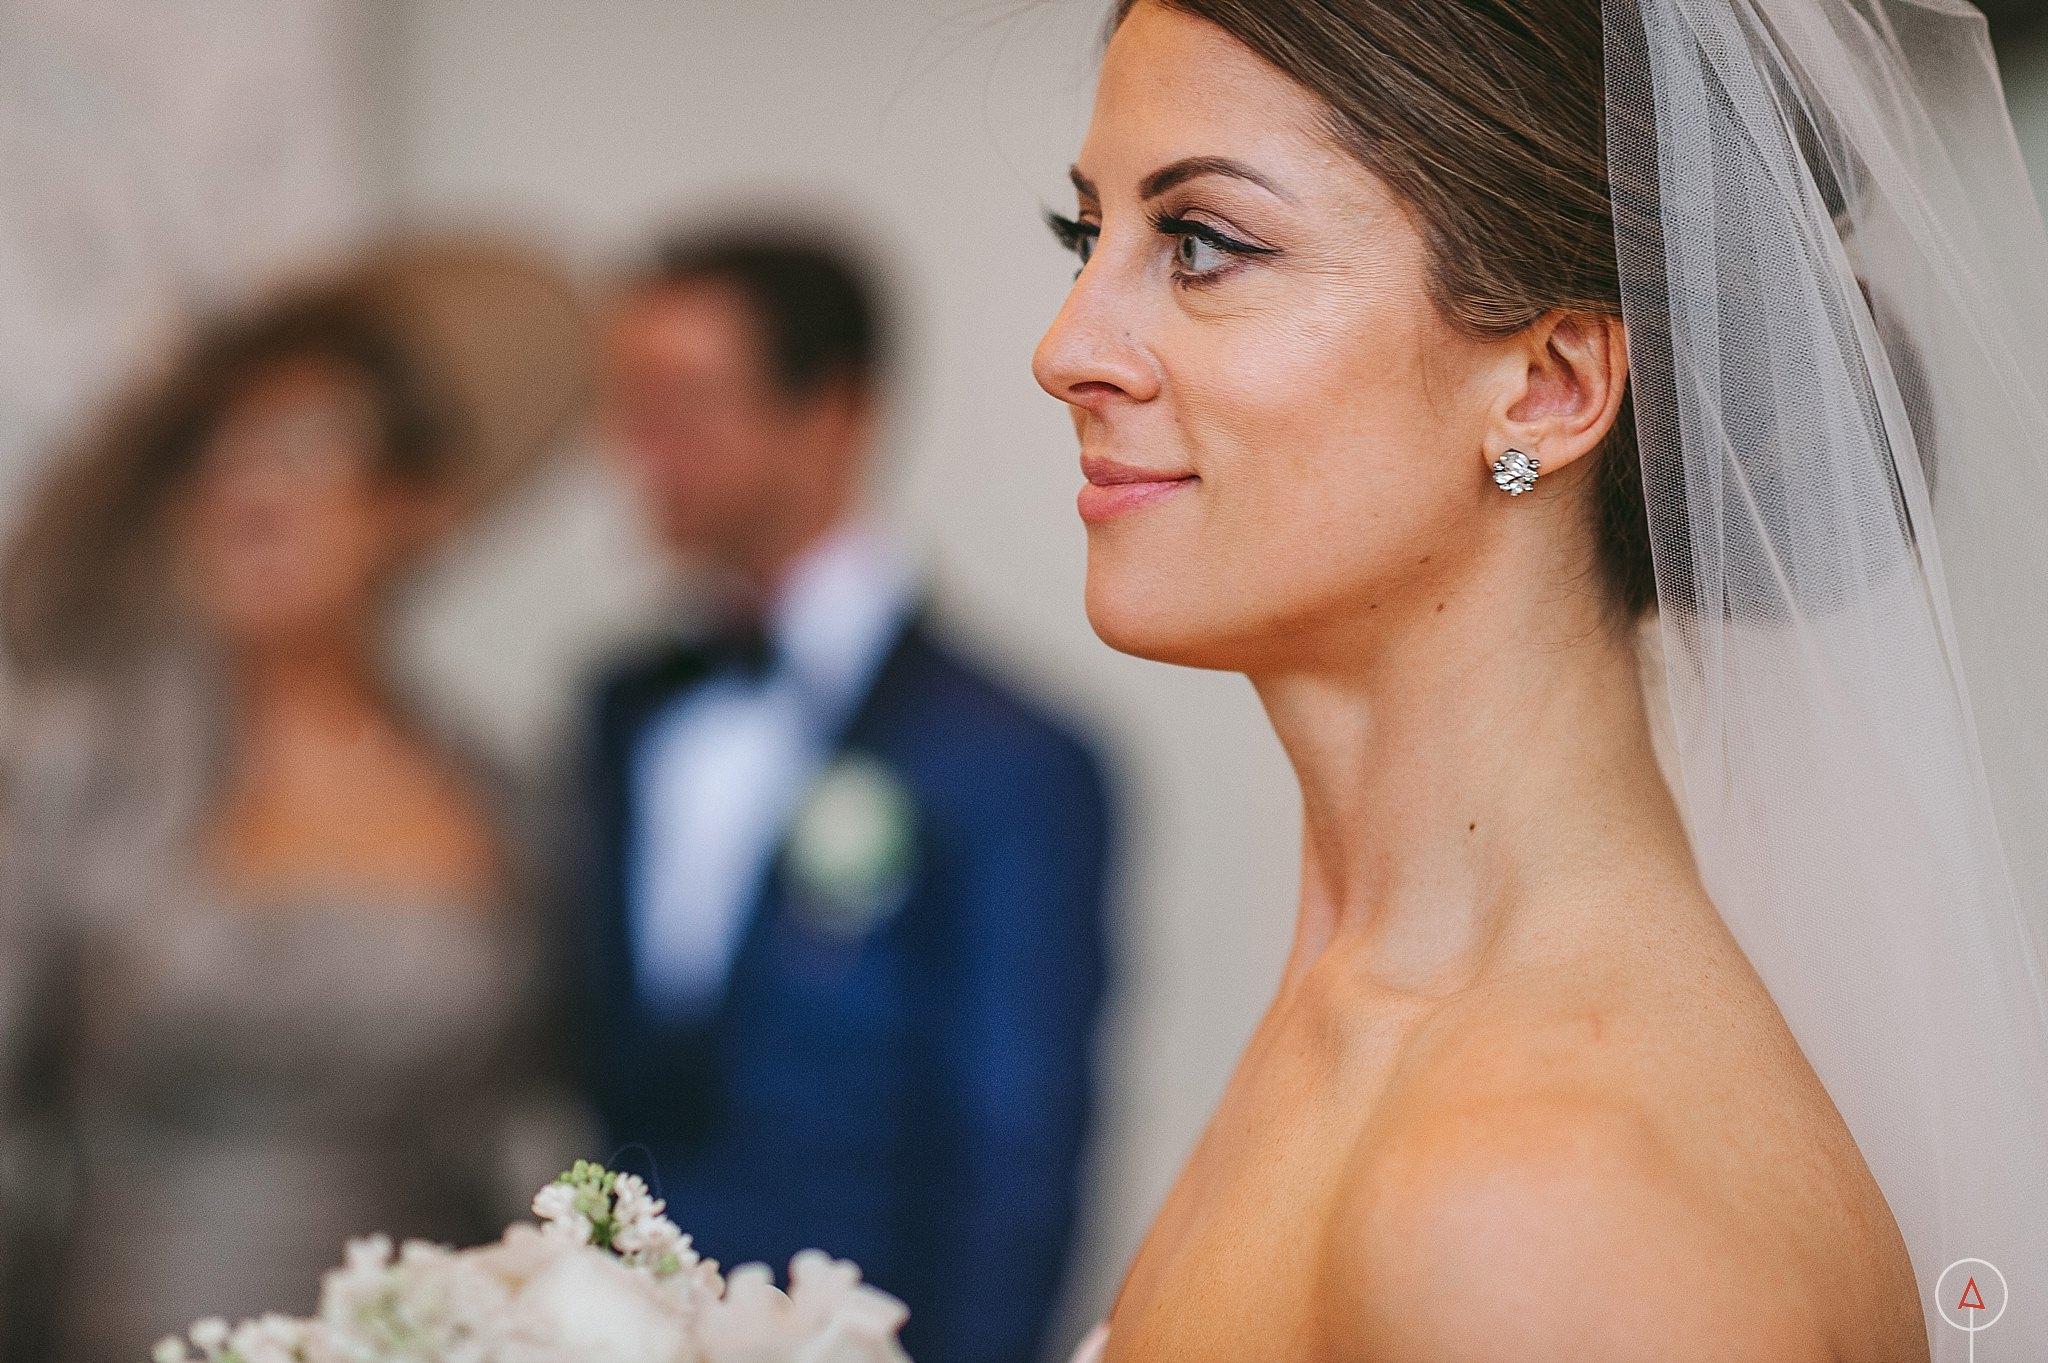 cardiff-wedding-photographer-aga-tomaszek_0295